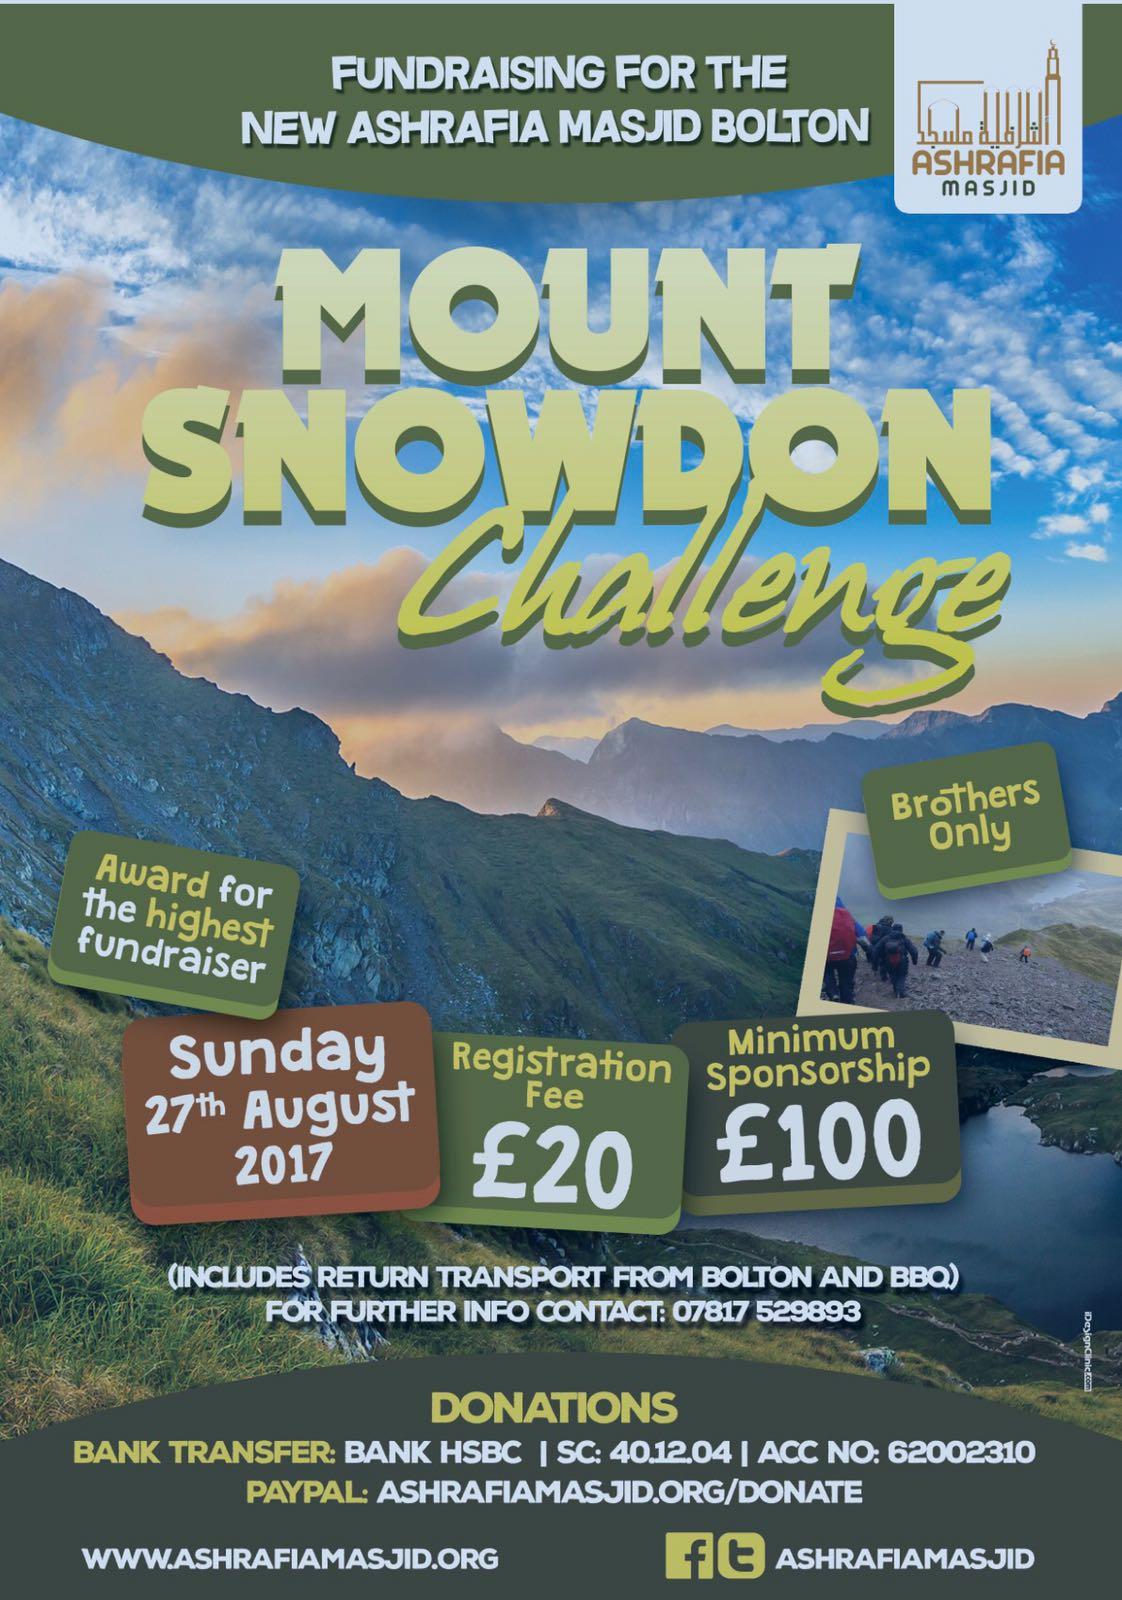 Mount Snowdon Sponshorship Event August 2017